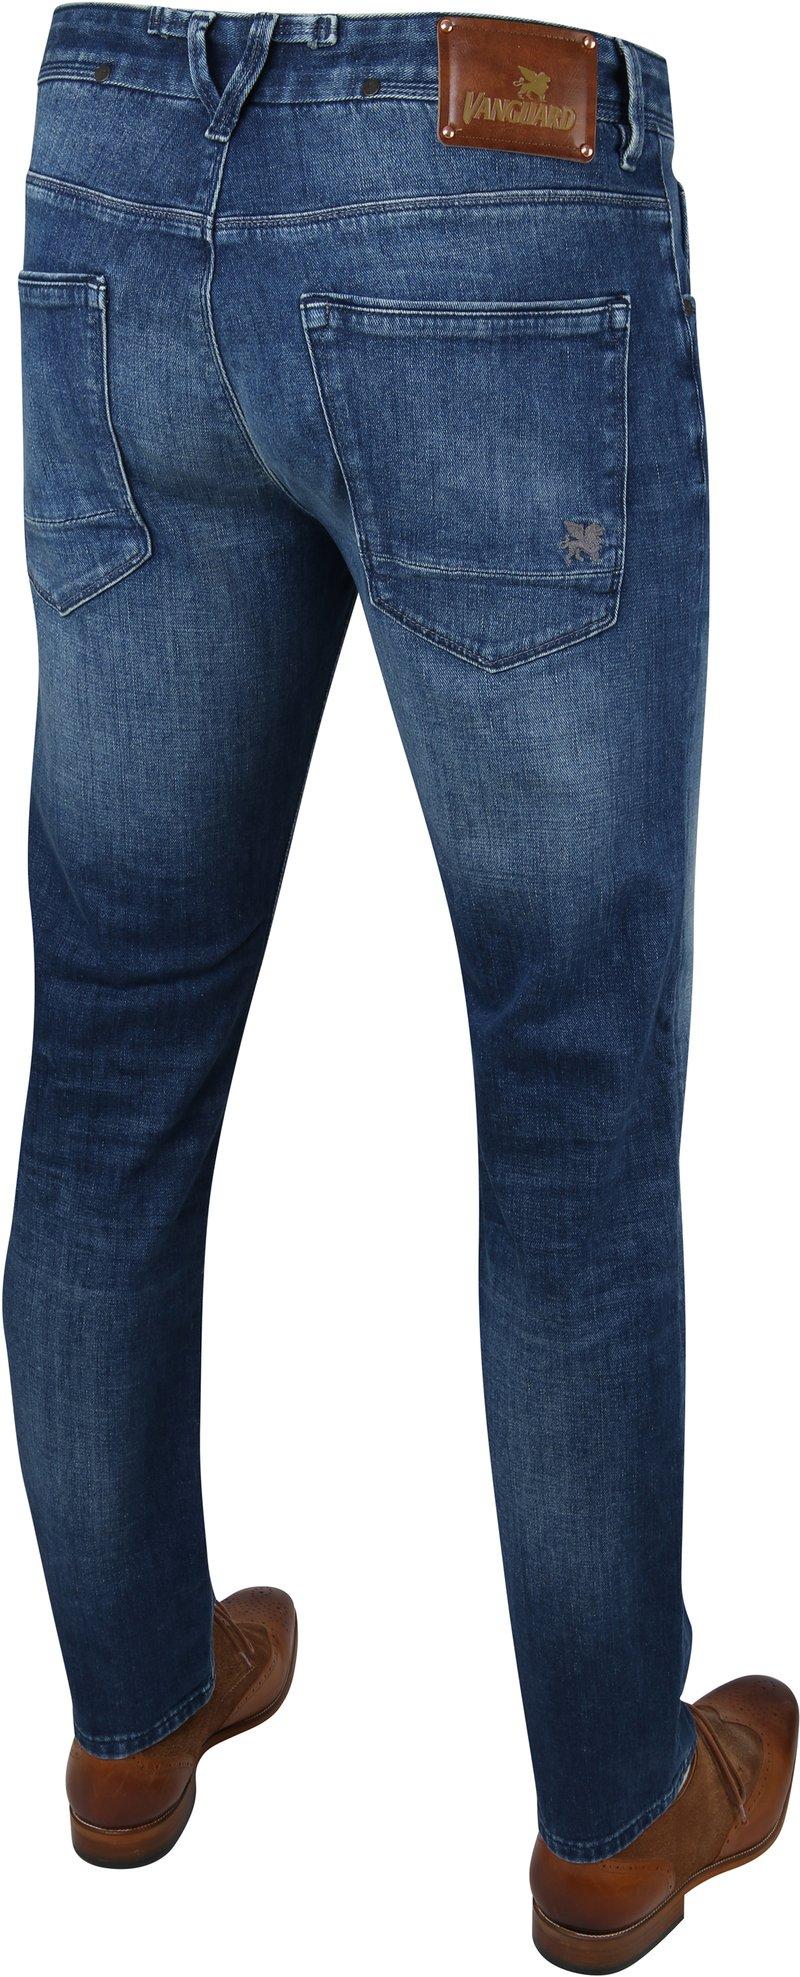 Vanguard V7 Rider Jeans Grey Beige photo 8